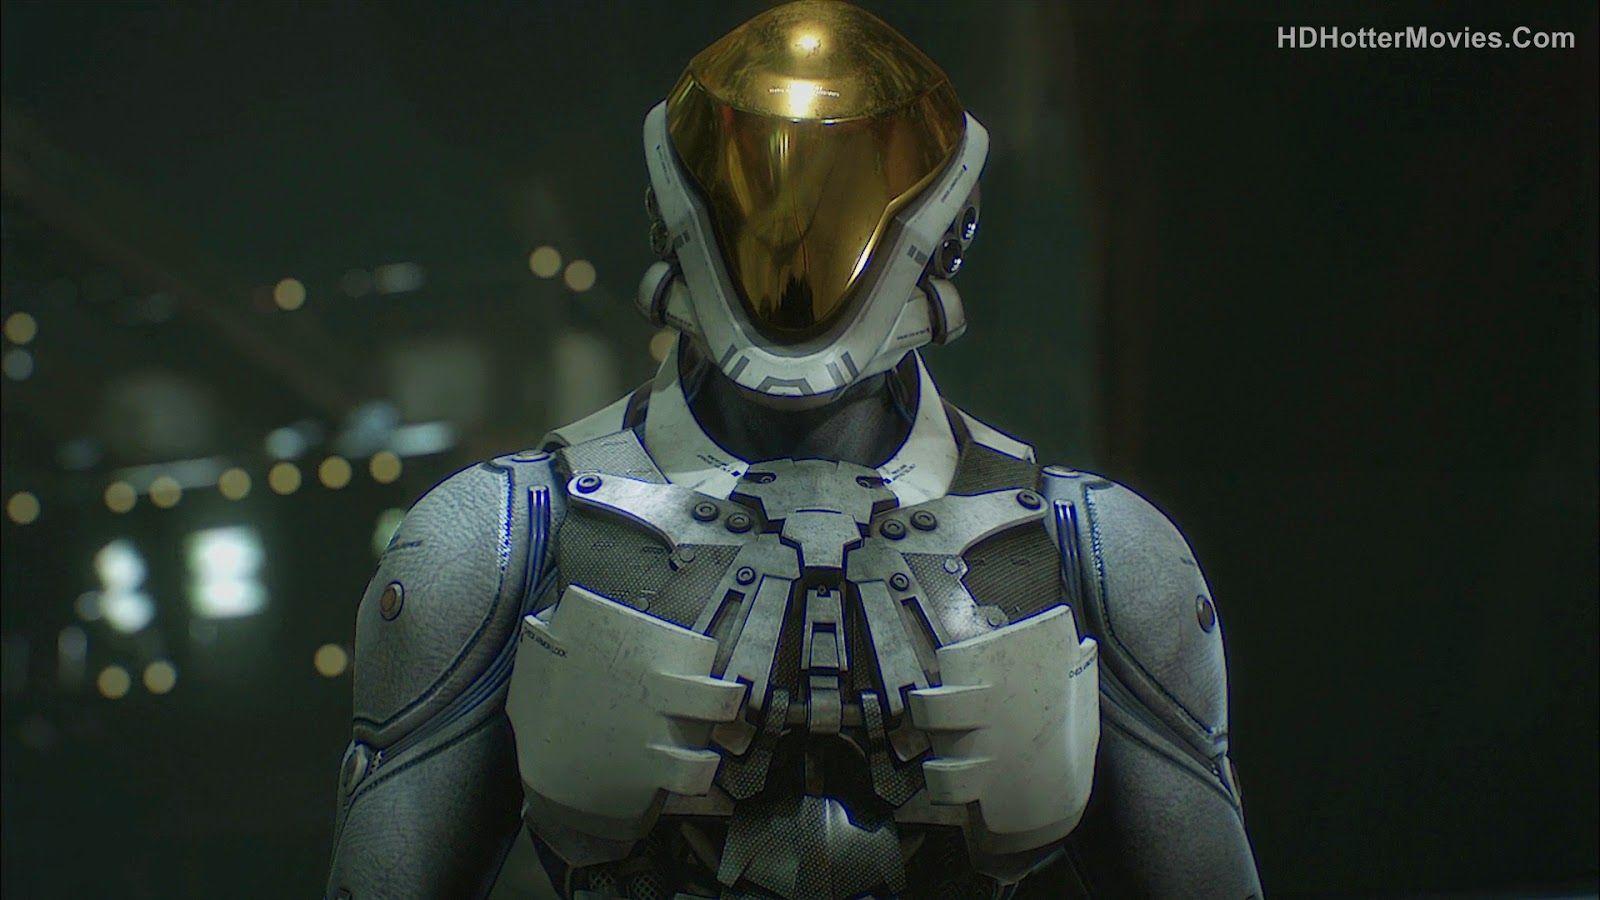 Appleseed Alpha Talos Combat Suit Samurai Helmet Cyberpunk Character